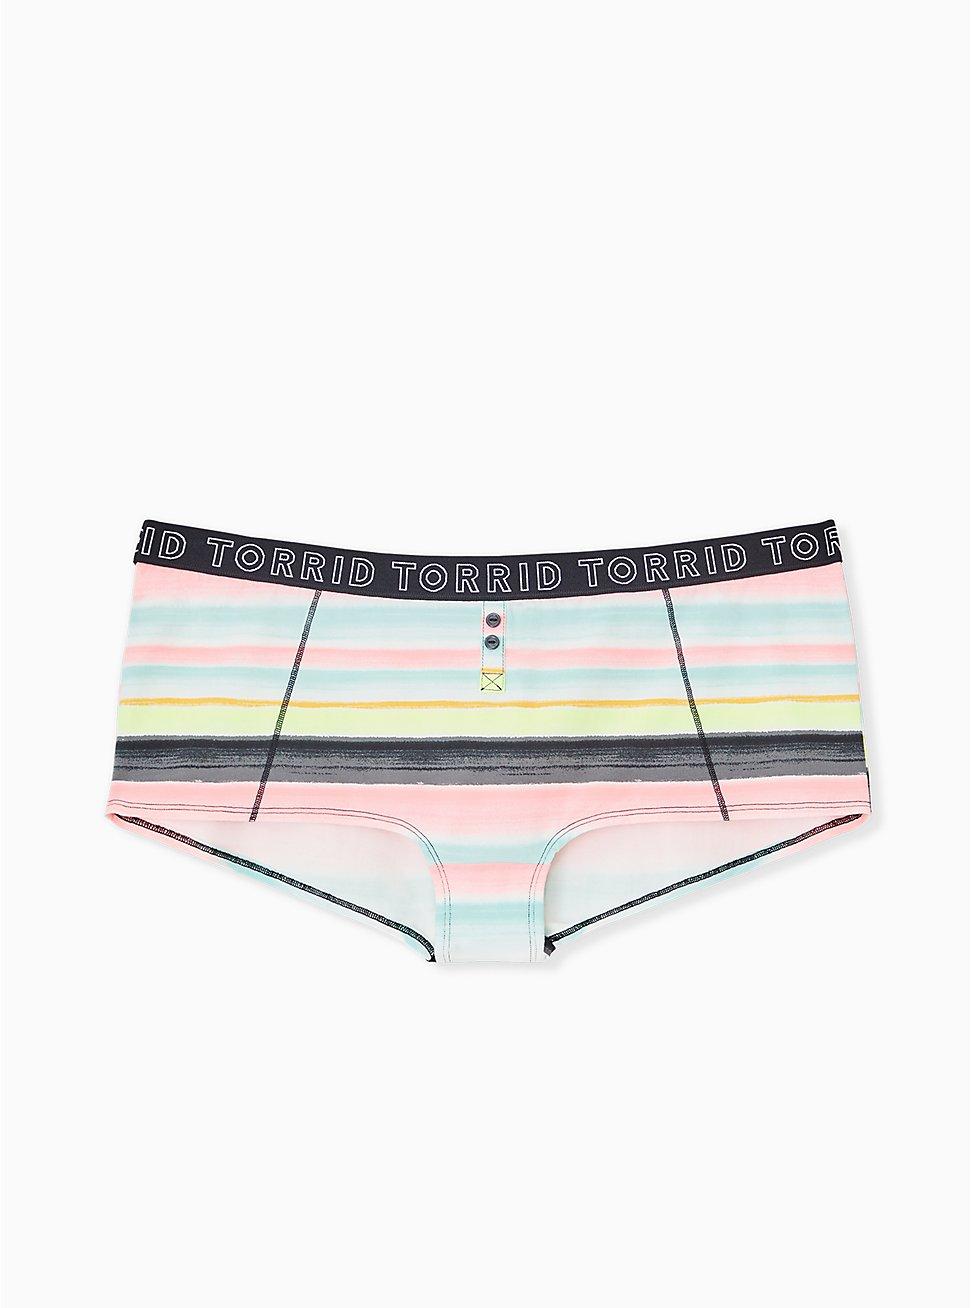 Torrid Logo Pastel Stripe Cotton Boyshort Panty, STRIPED WASH- MINT, hi-res